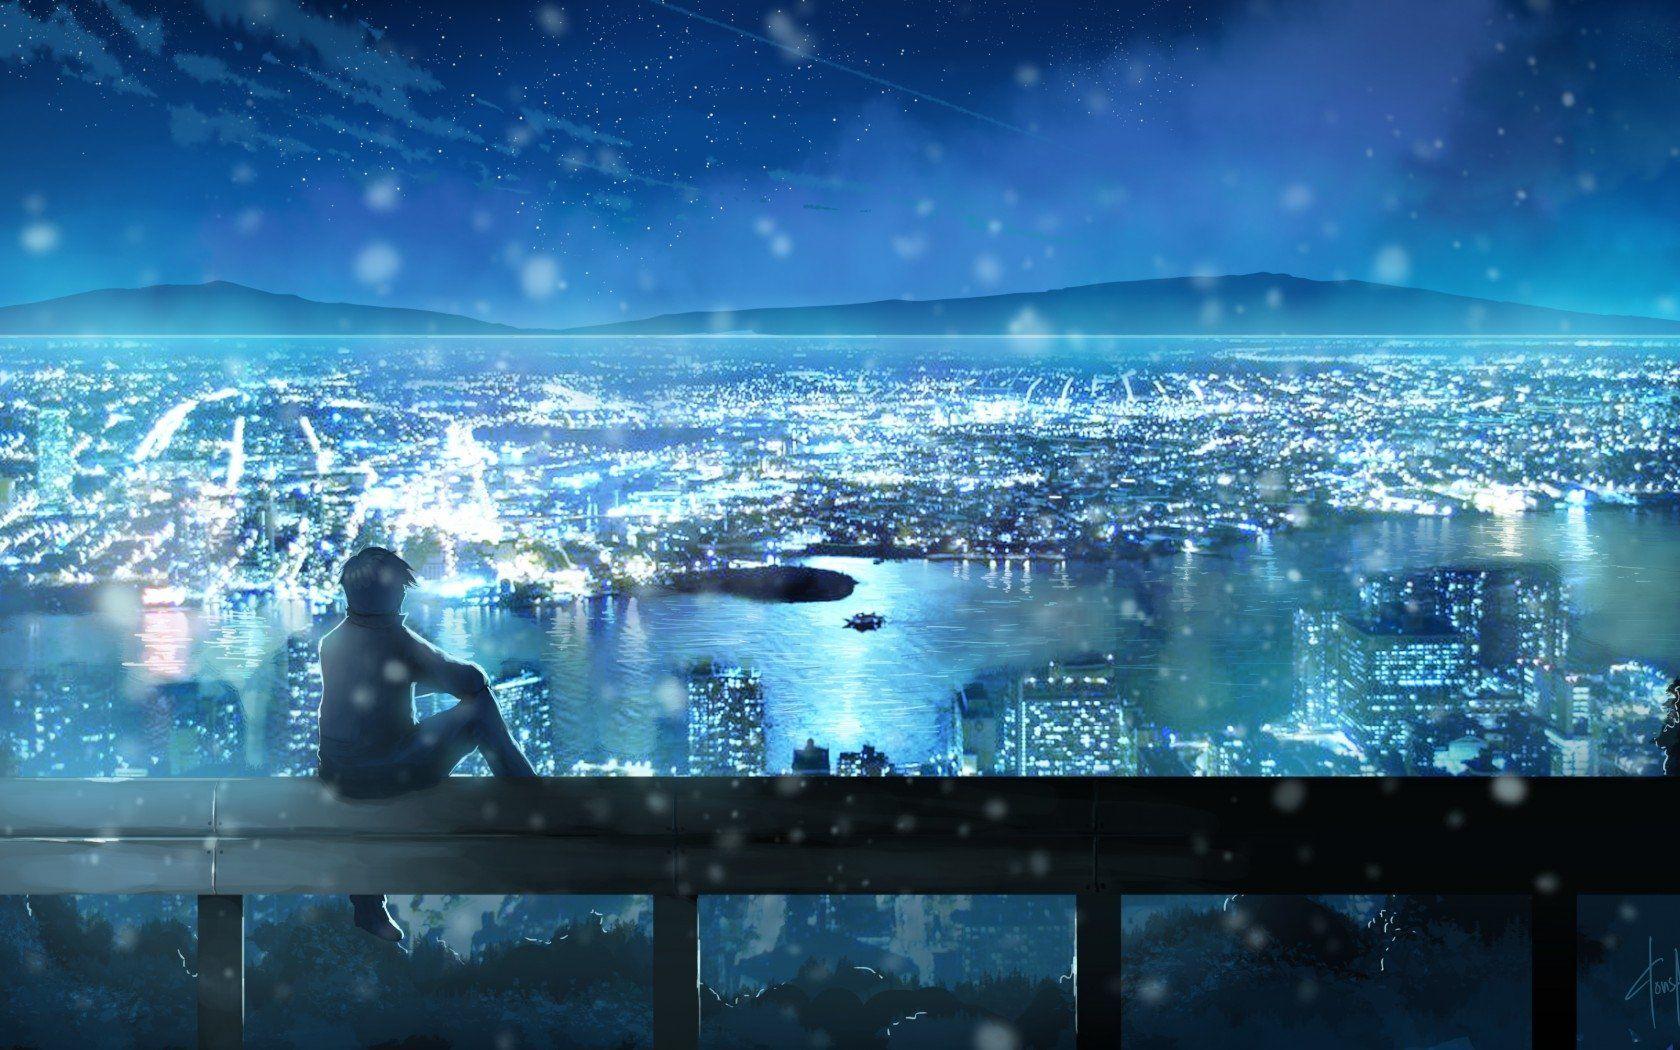 Resultado De Imagen Para Anime Boy Looking At The Night City Anime Scenery Wallpaper Anime Scenery Scenery